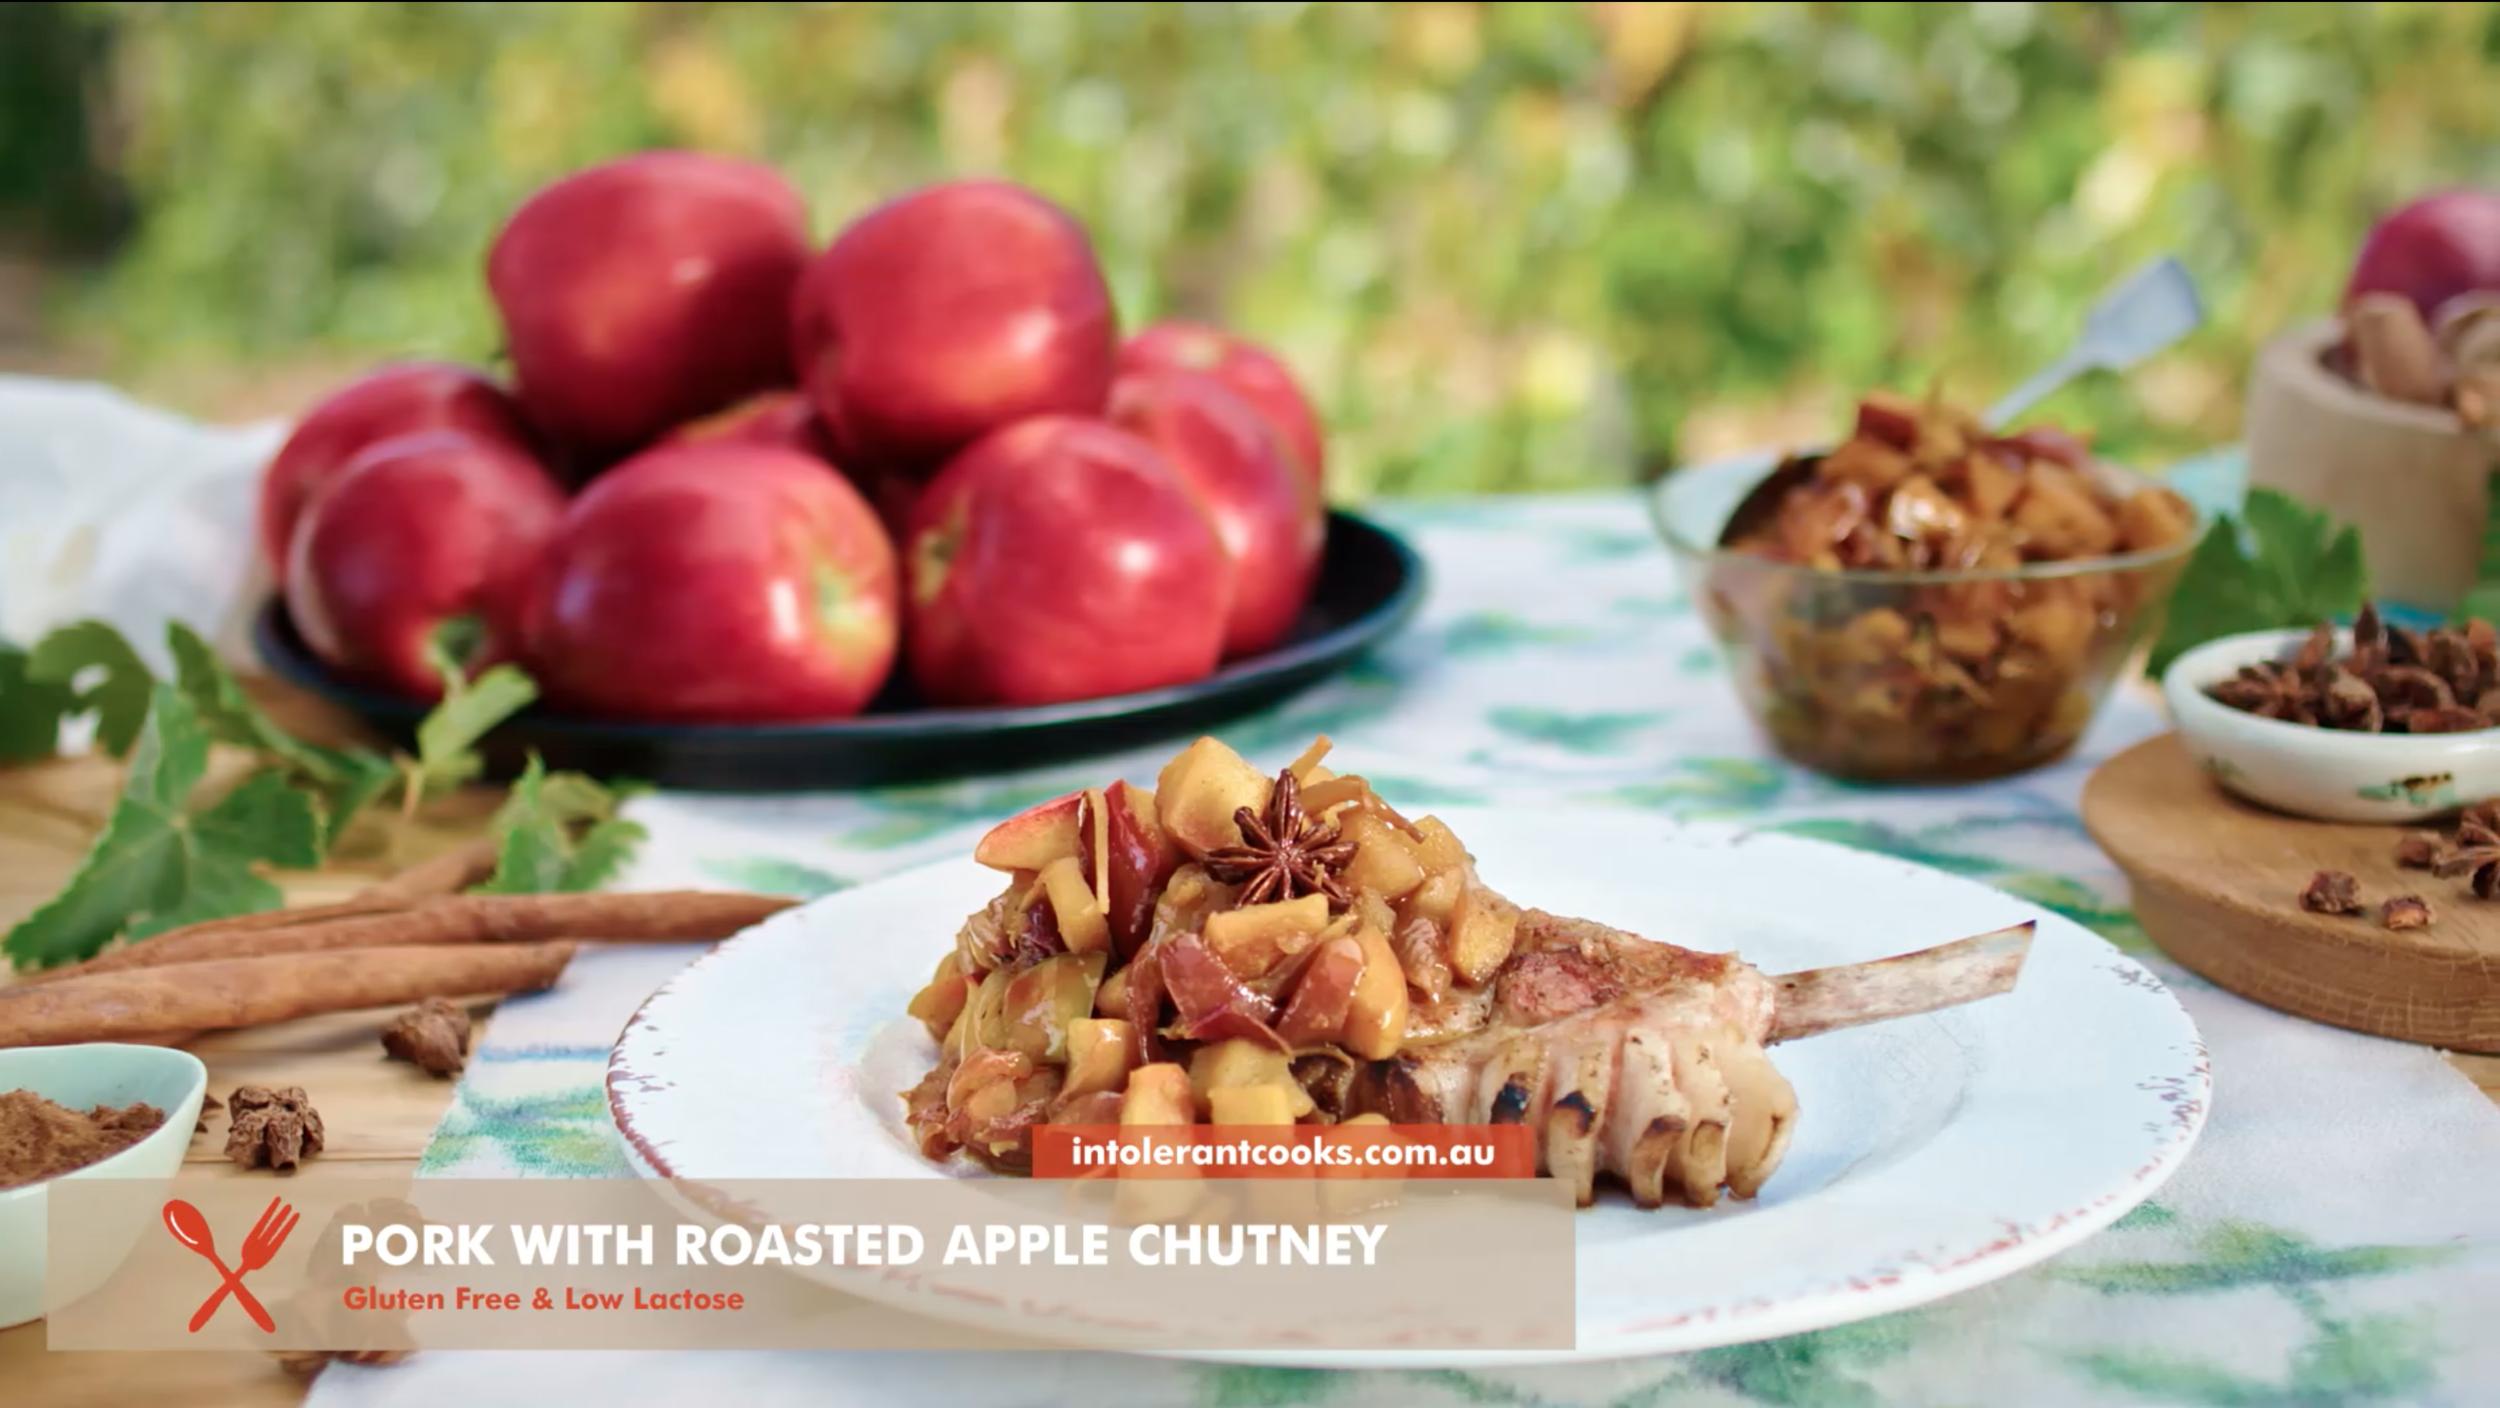 Pork Chops with Roasted Spiced Apple Chutney